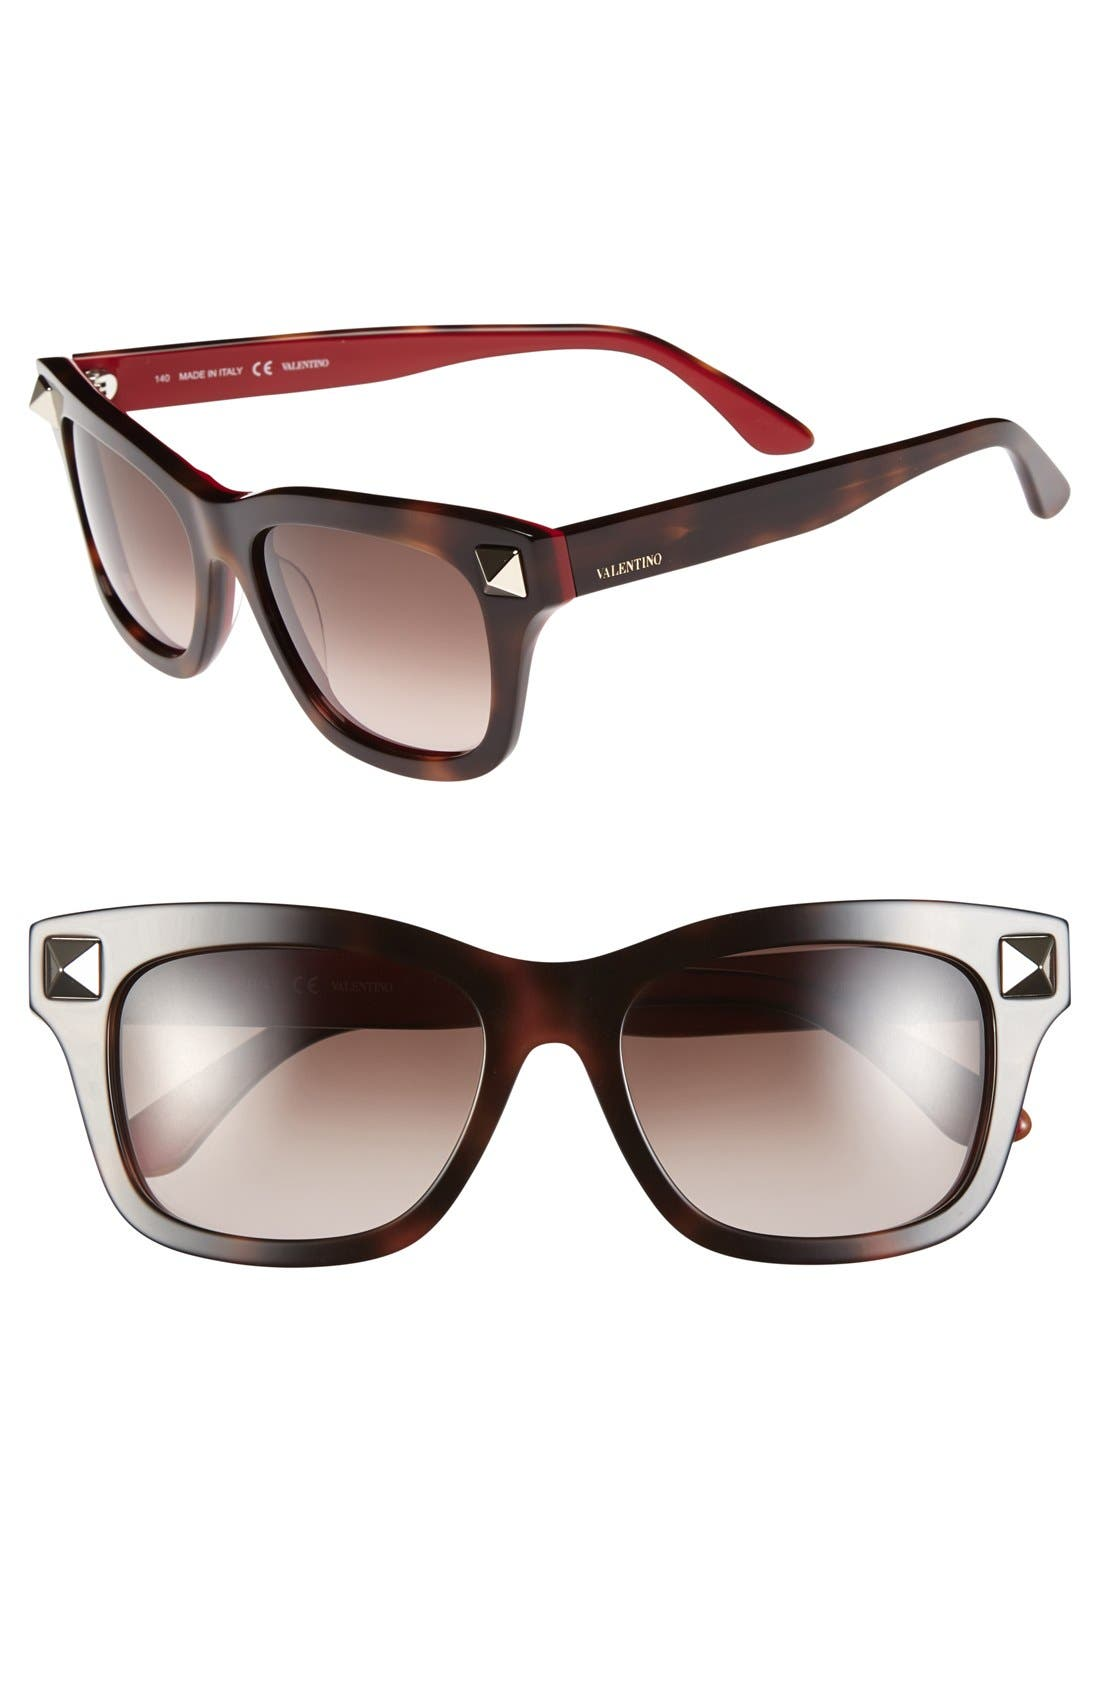 Main Image - Valentino 'Rockstud' 53mm Studded Sunglasses